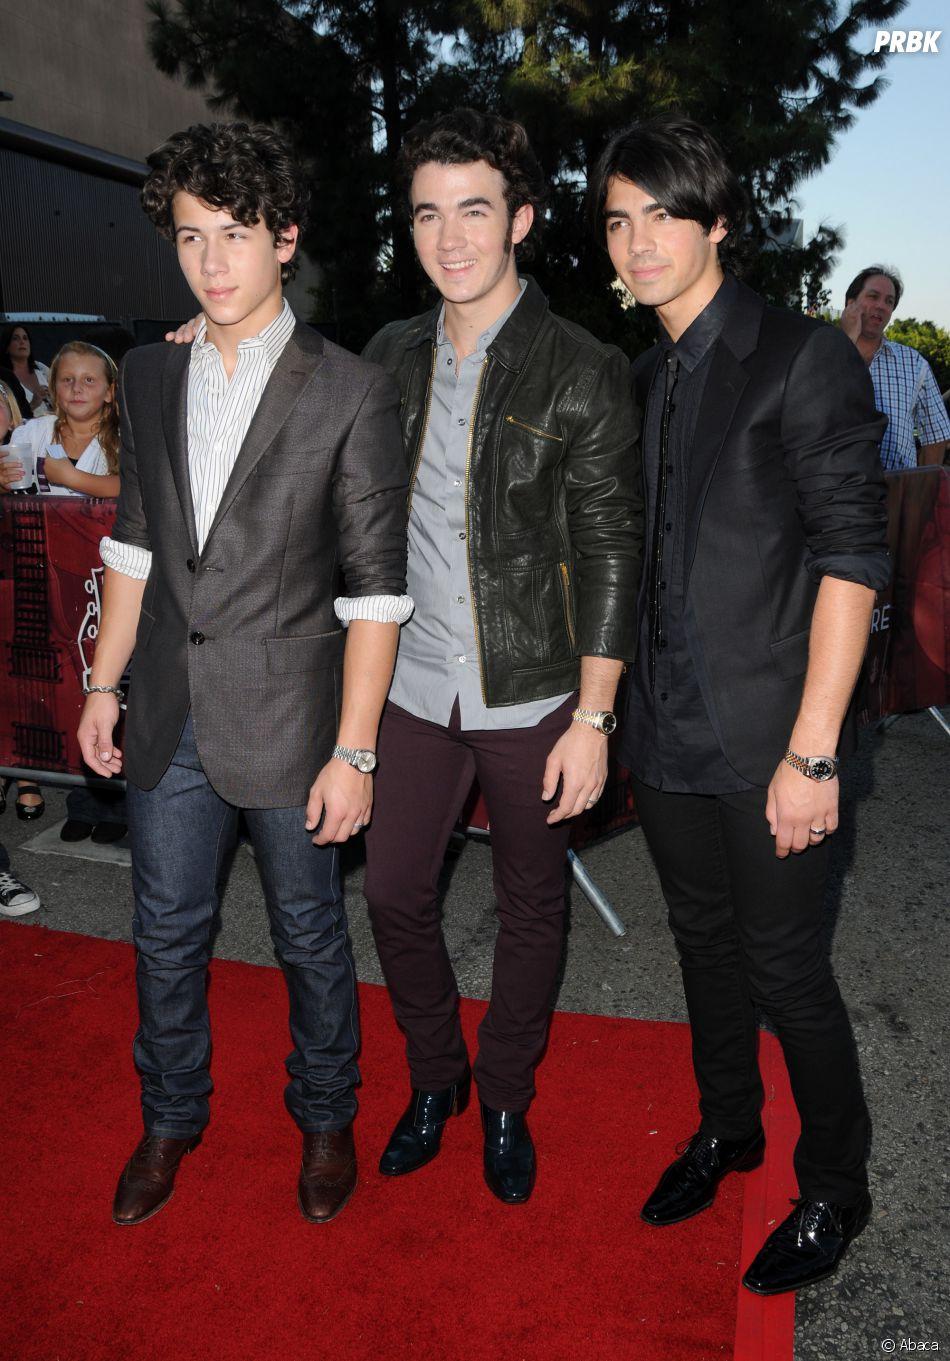 Joe Jonas, Nick Jonas et Kevin Jonas : les trois Jonas Brothers portaient un anneau de pureté.